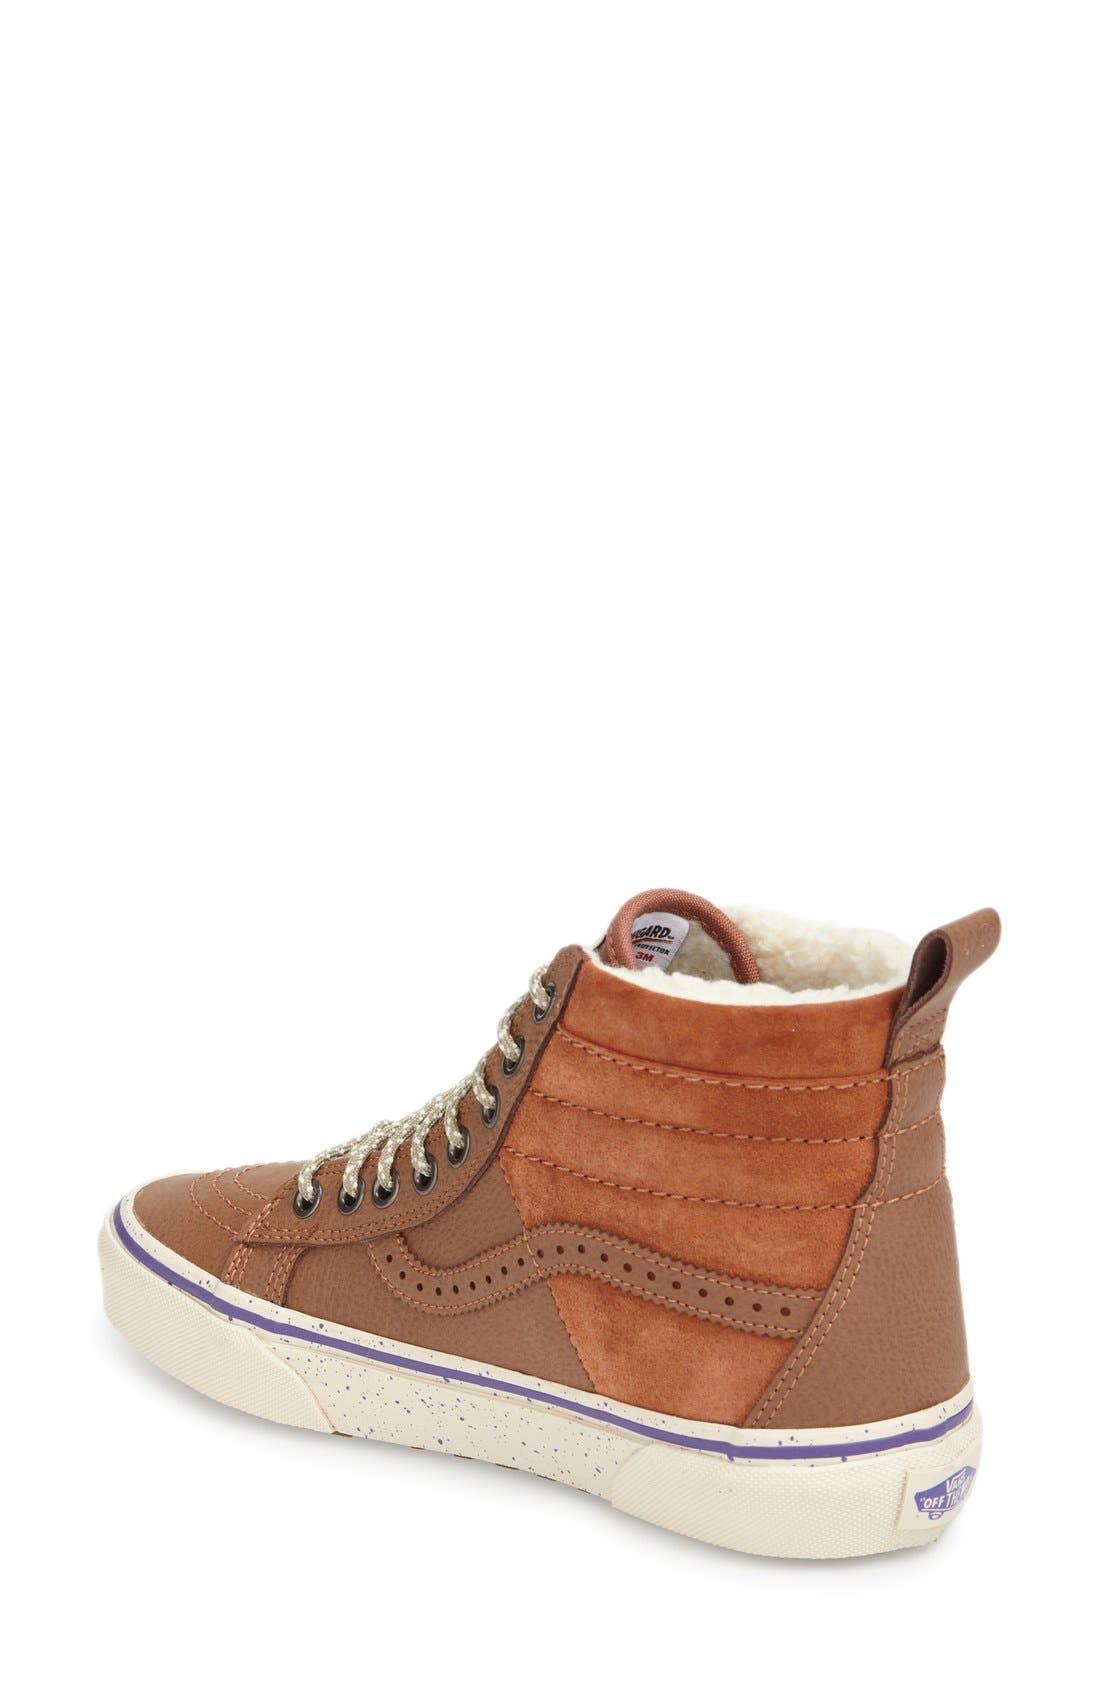 Alternate Image 2  - Vans Hana Beaman – SK8-Hi 46 MTE Water Resistant Sneaker (Women)